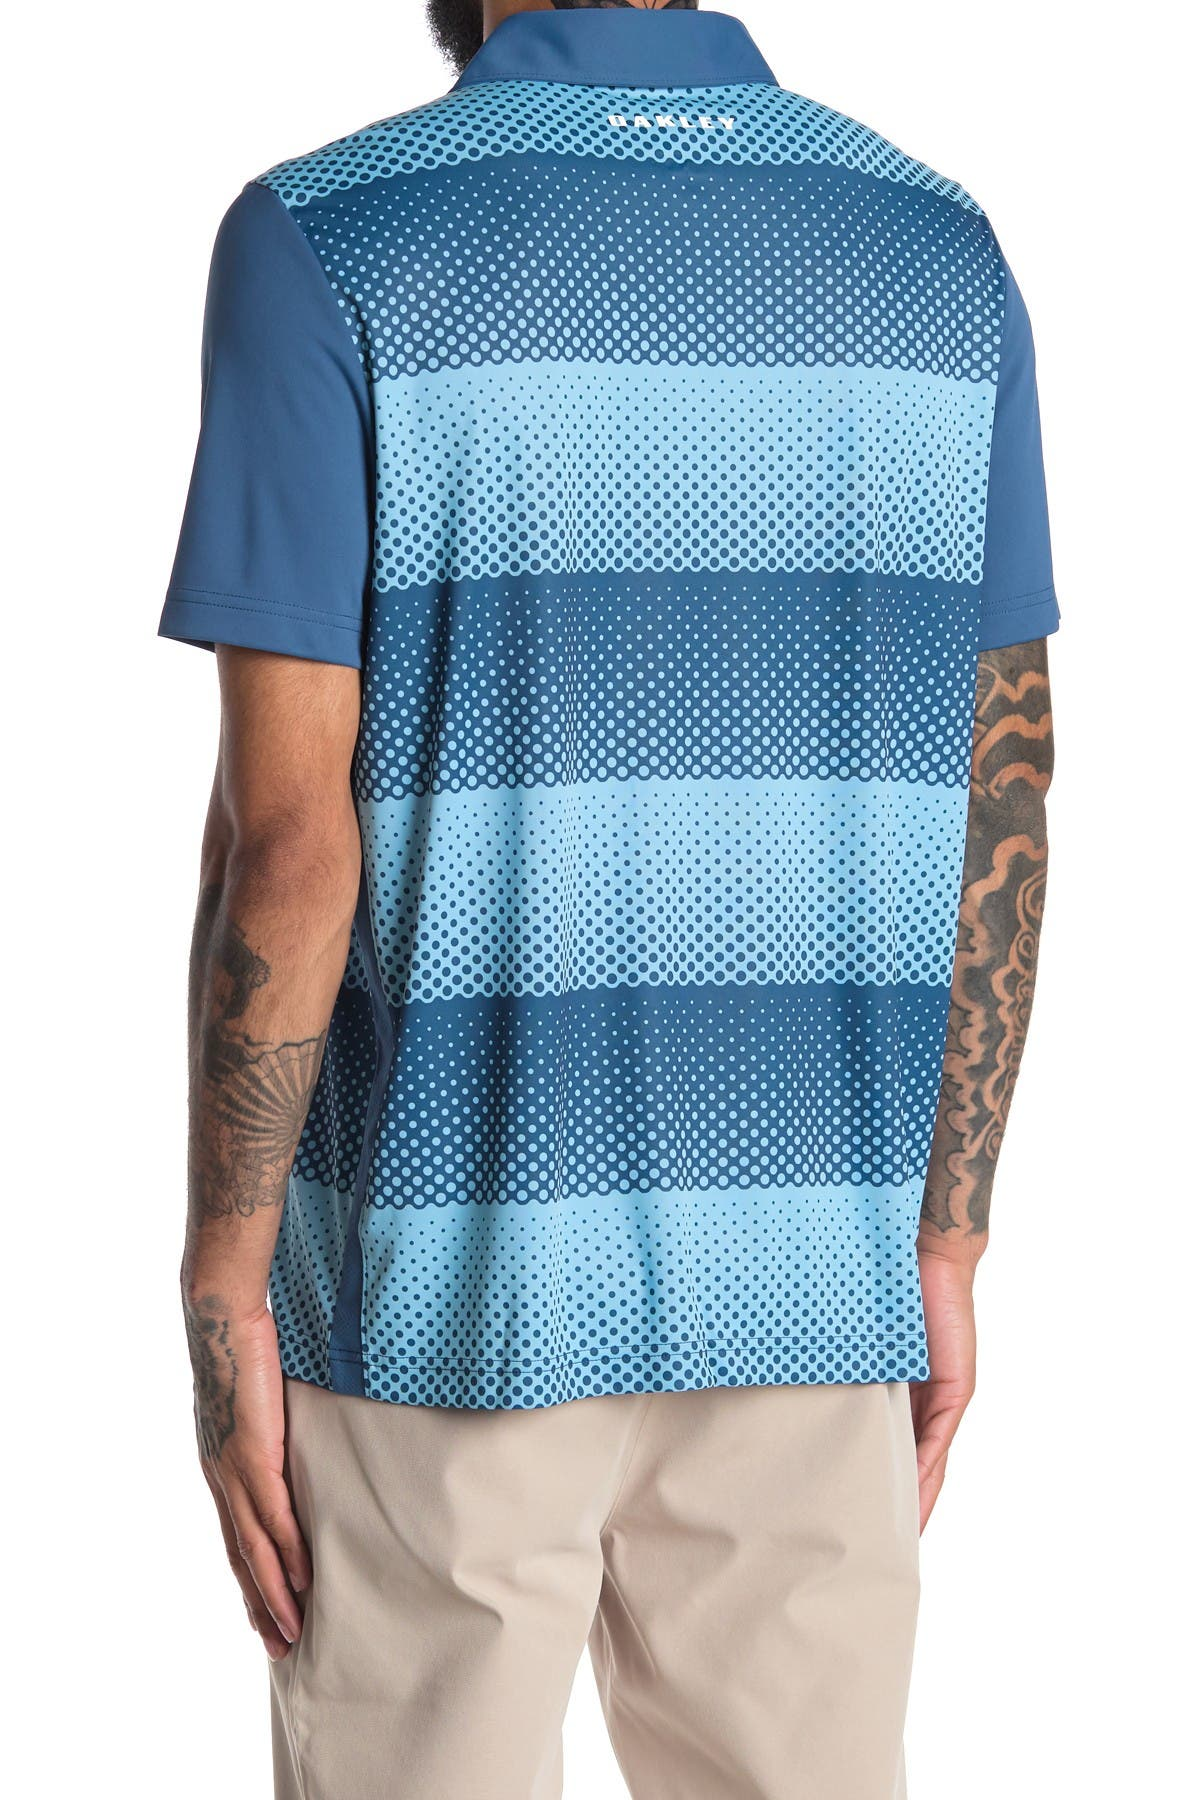 Image of Oakley Dot Stripes Polo